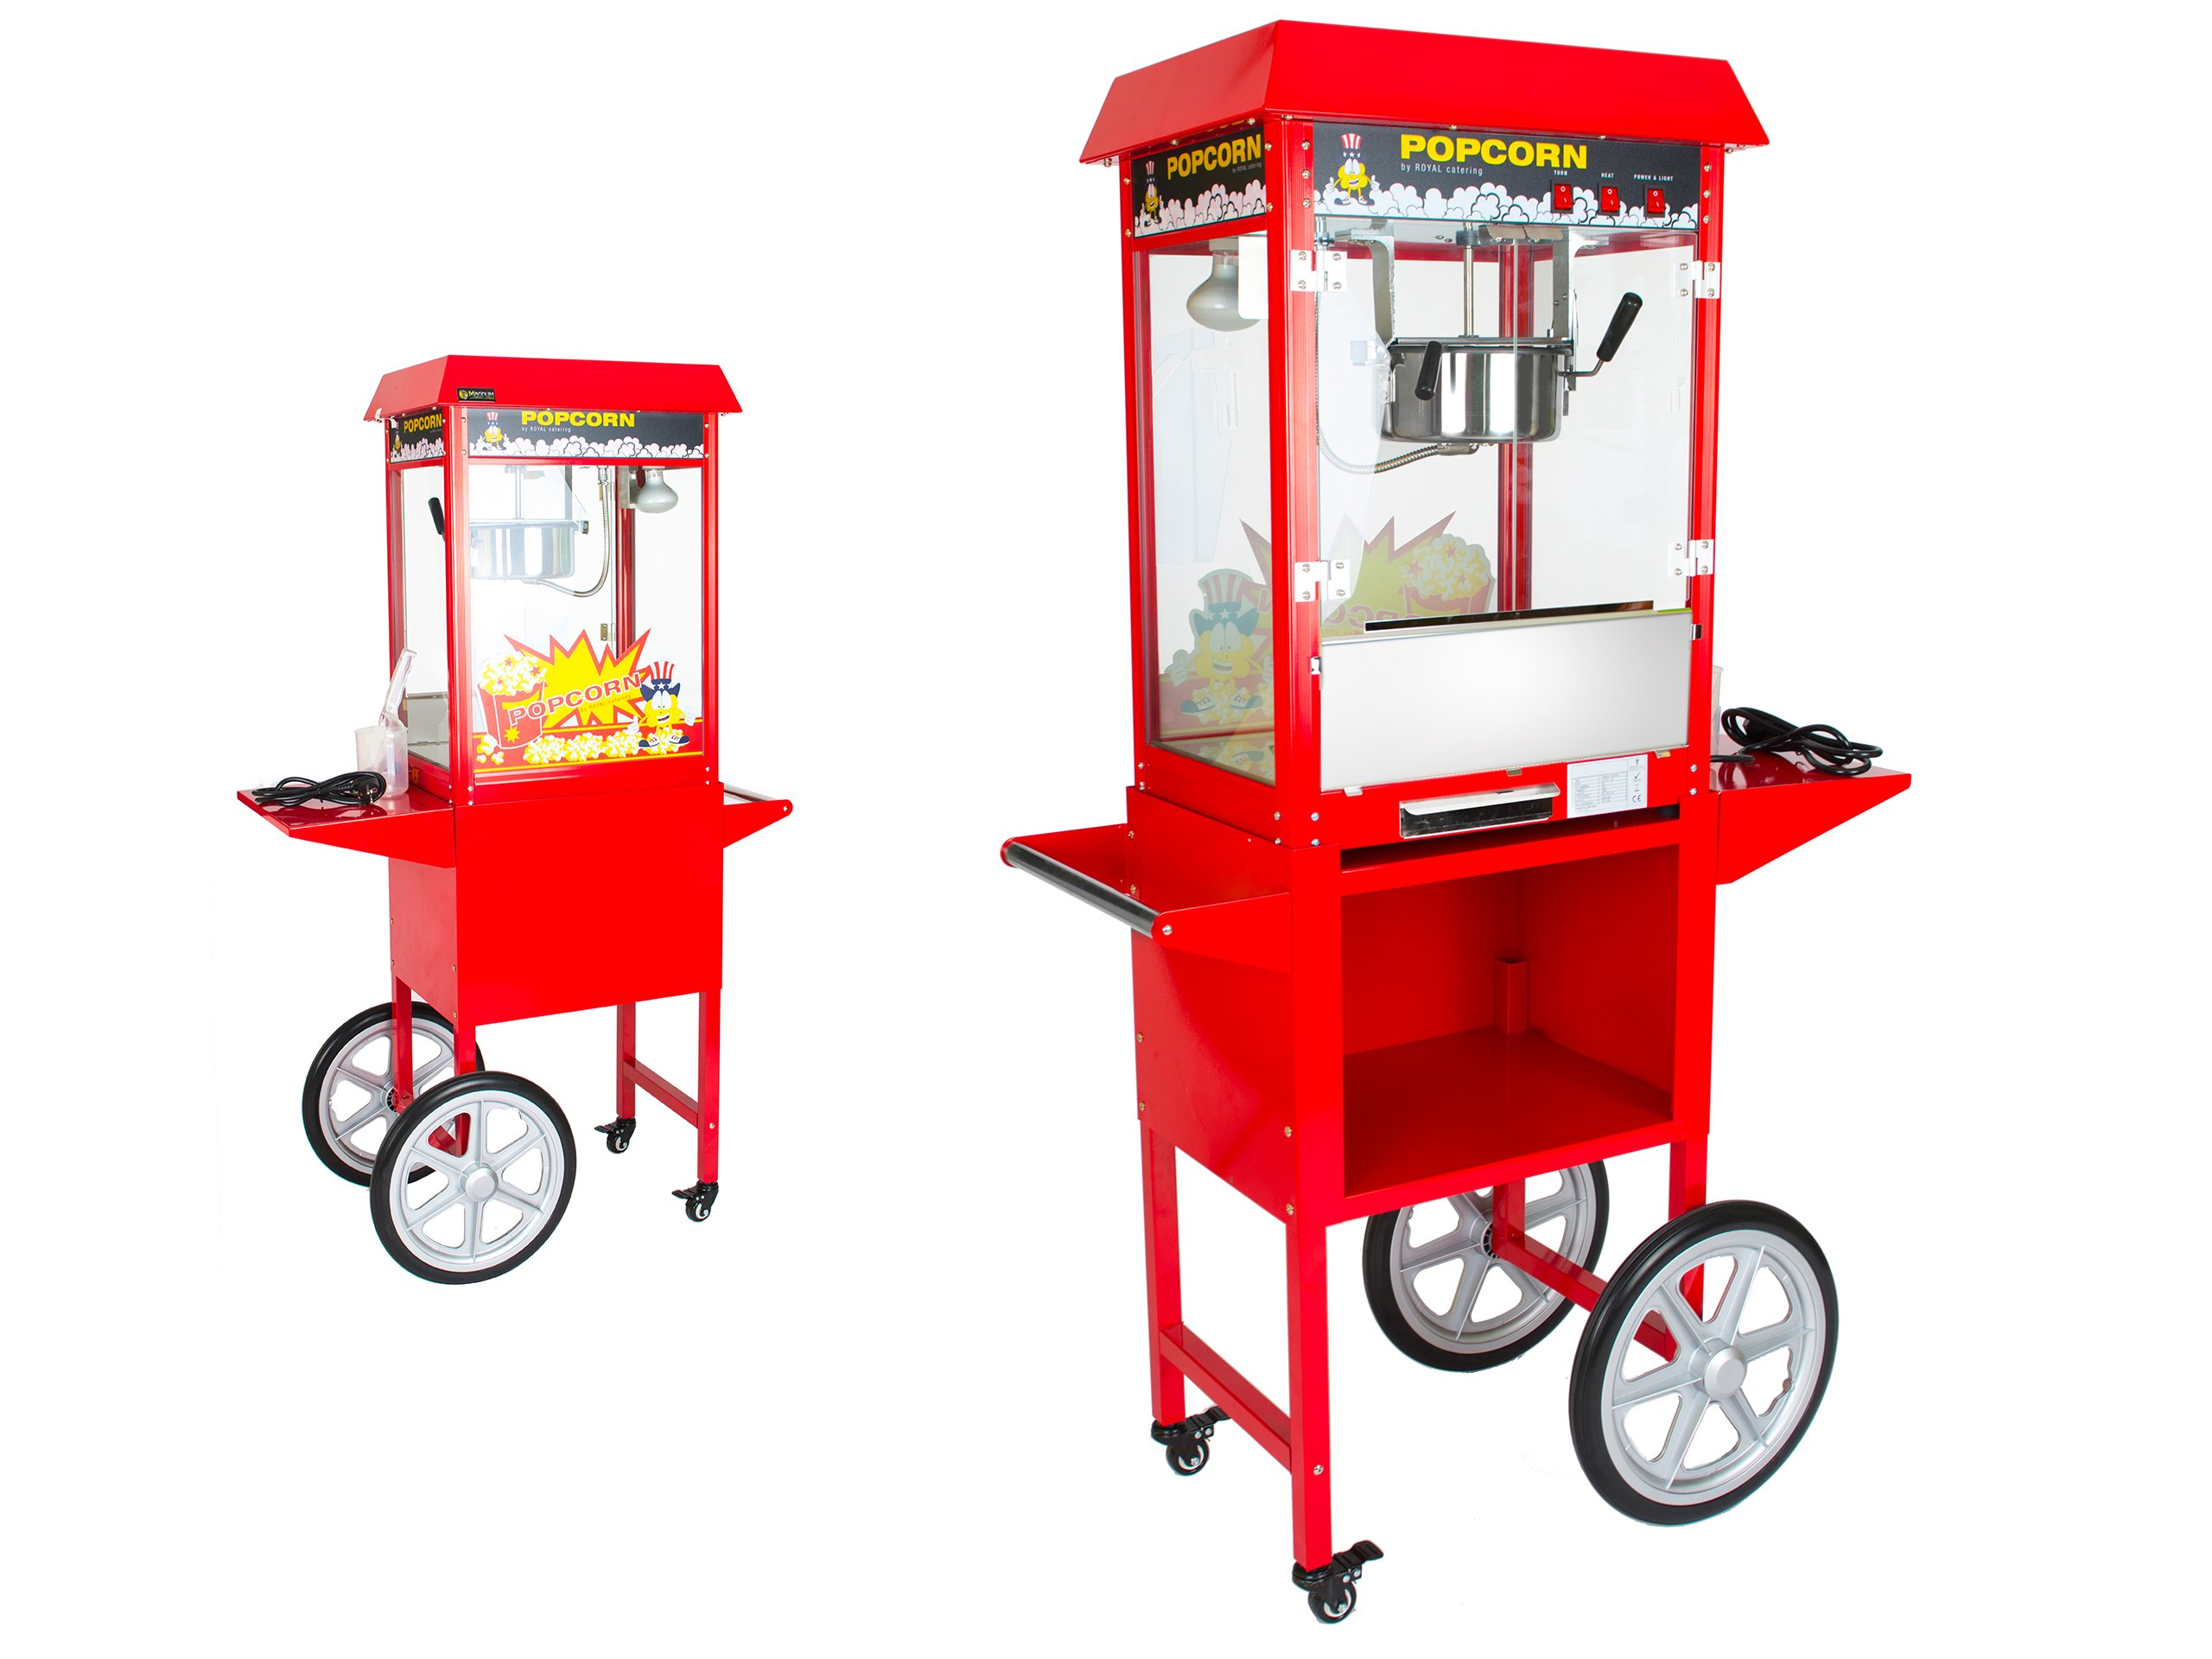 Holiaci strojček na praženú kukuricu popcorn s vozíkom